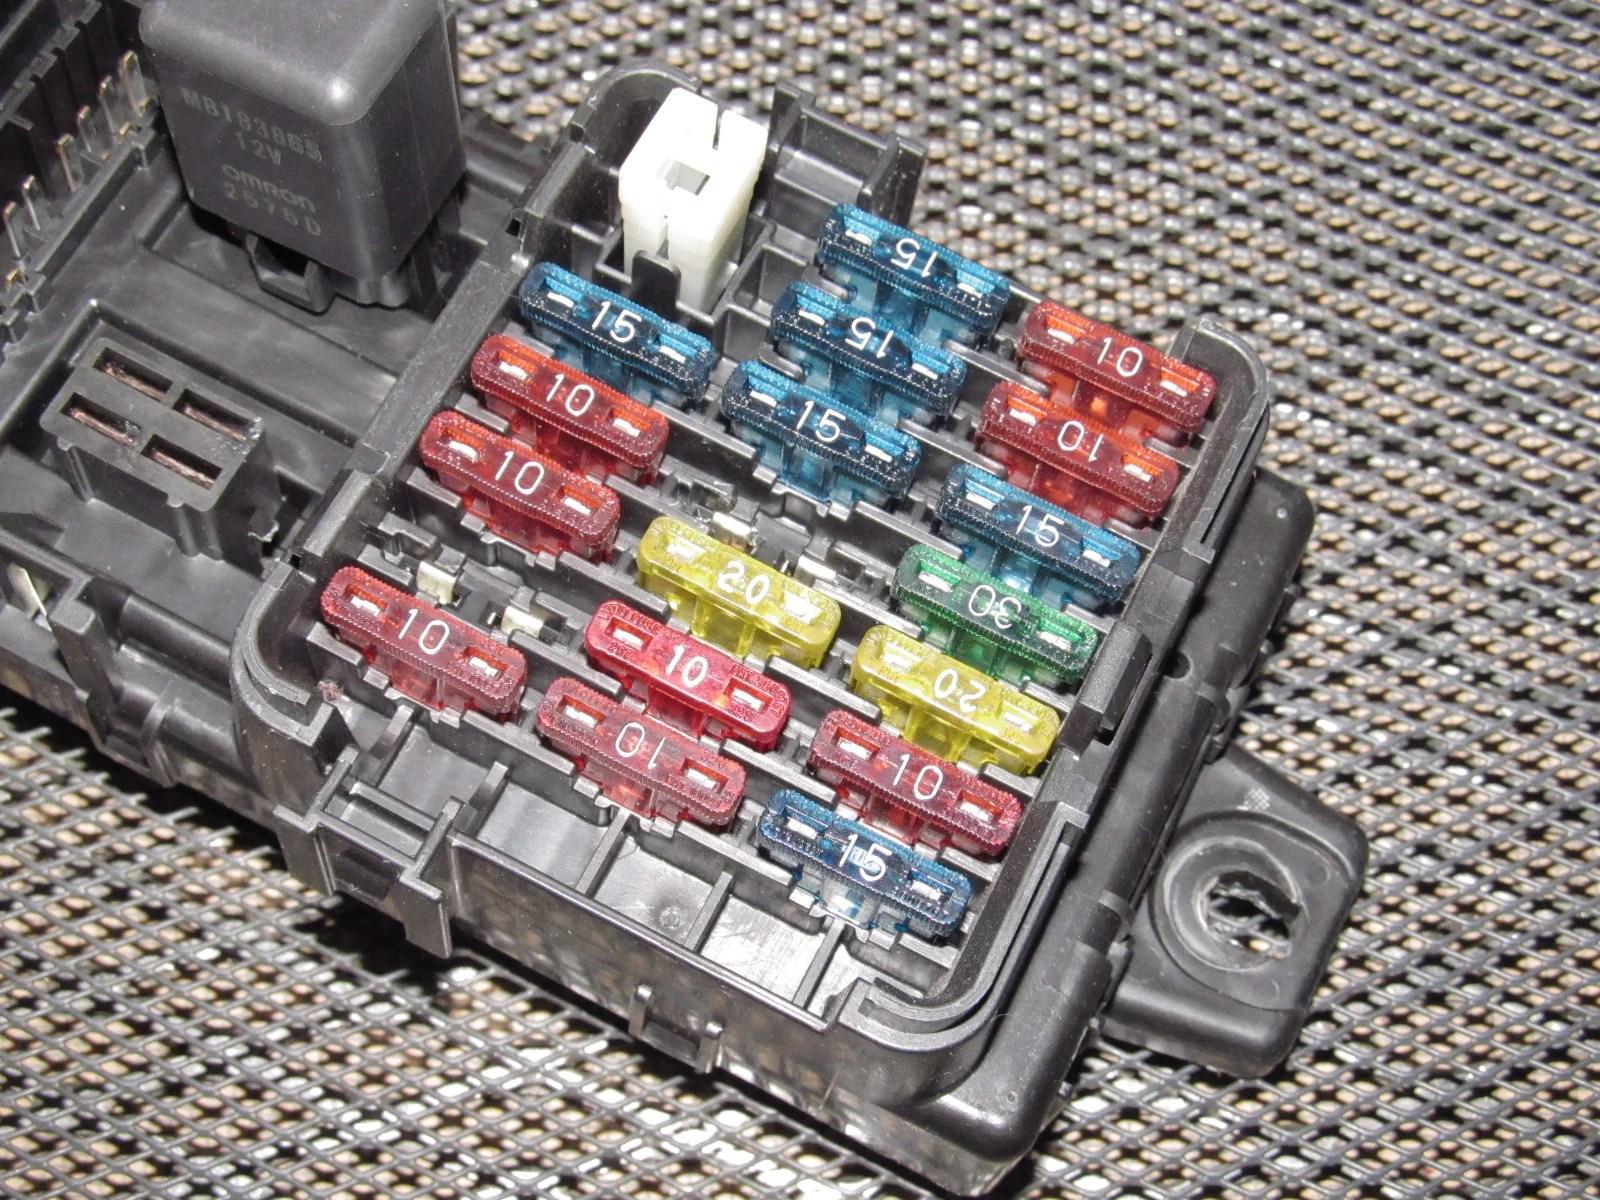 94 95 96 97 mitsubishi 3000gt oem interior fuse box  [ 1600 x 1200 Pixel ]